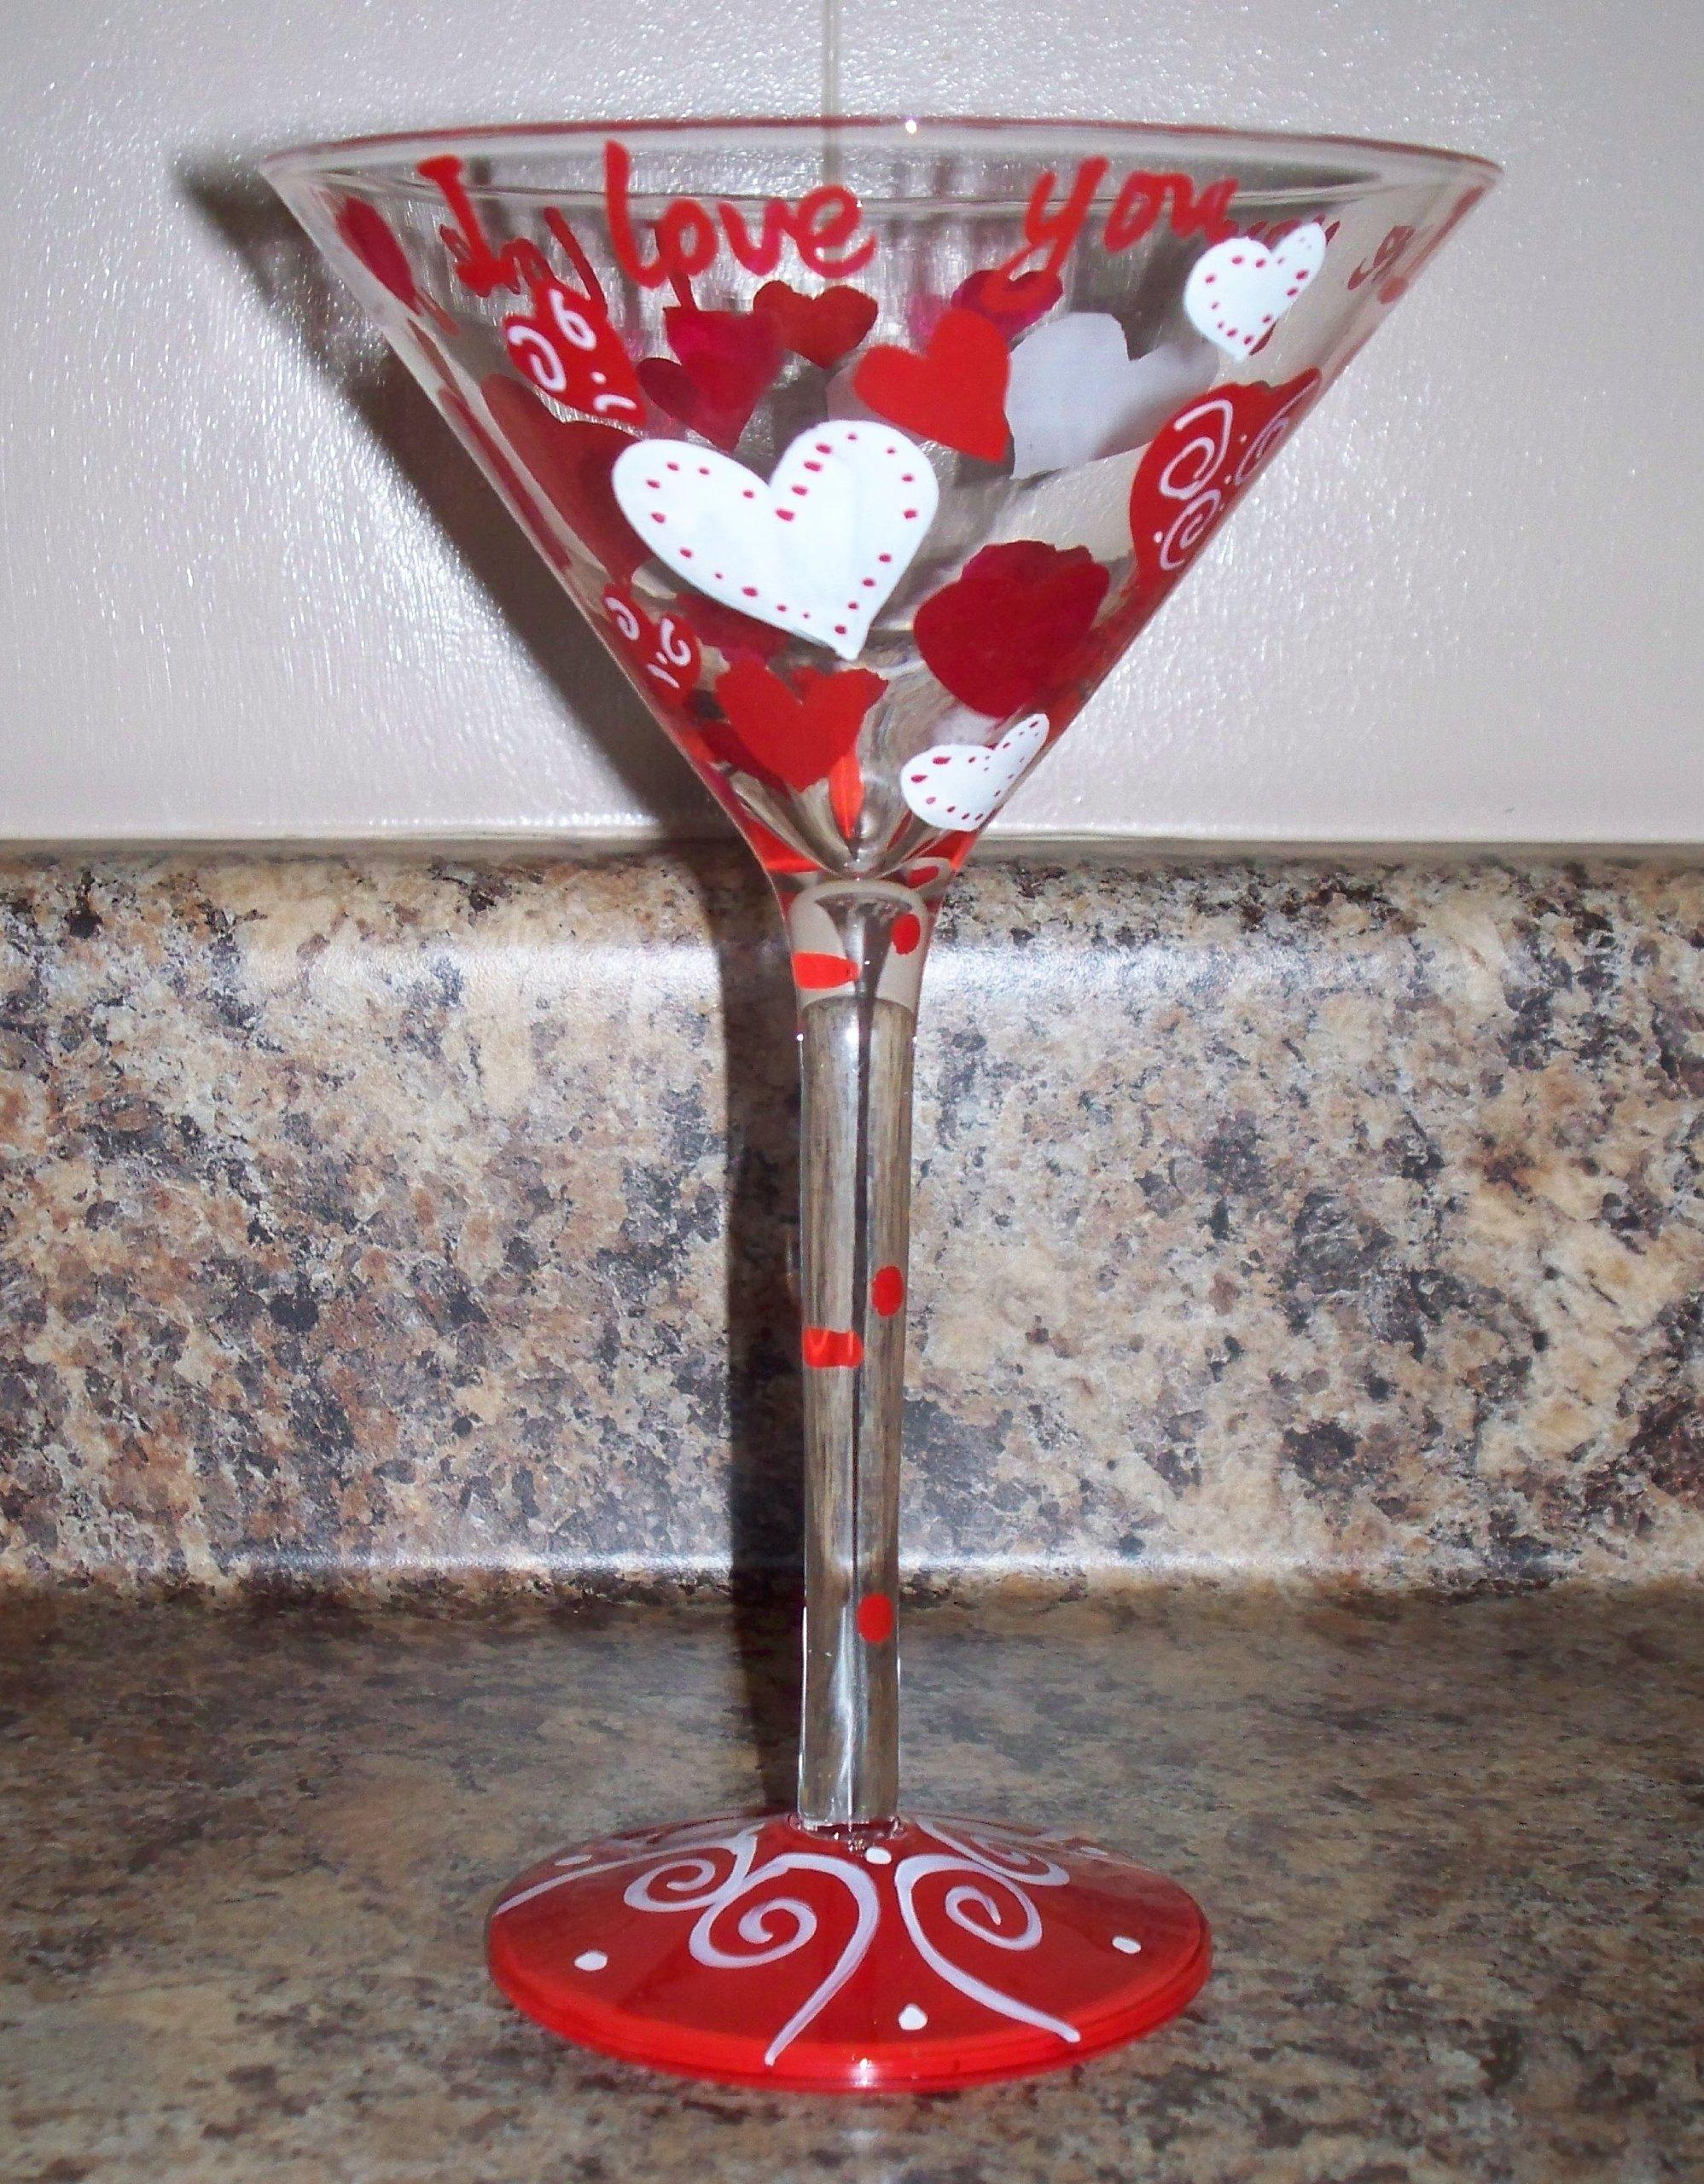 ''I Love You'' 7oz. Hand Painted Martini Glass